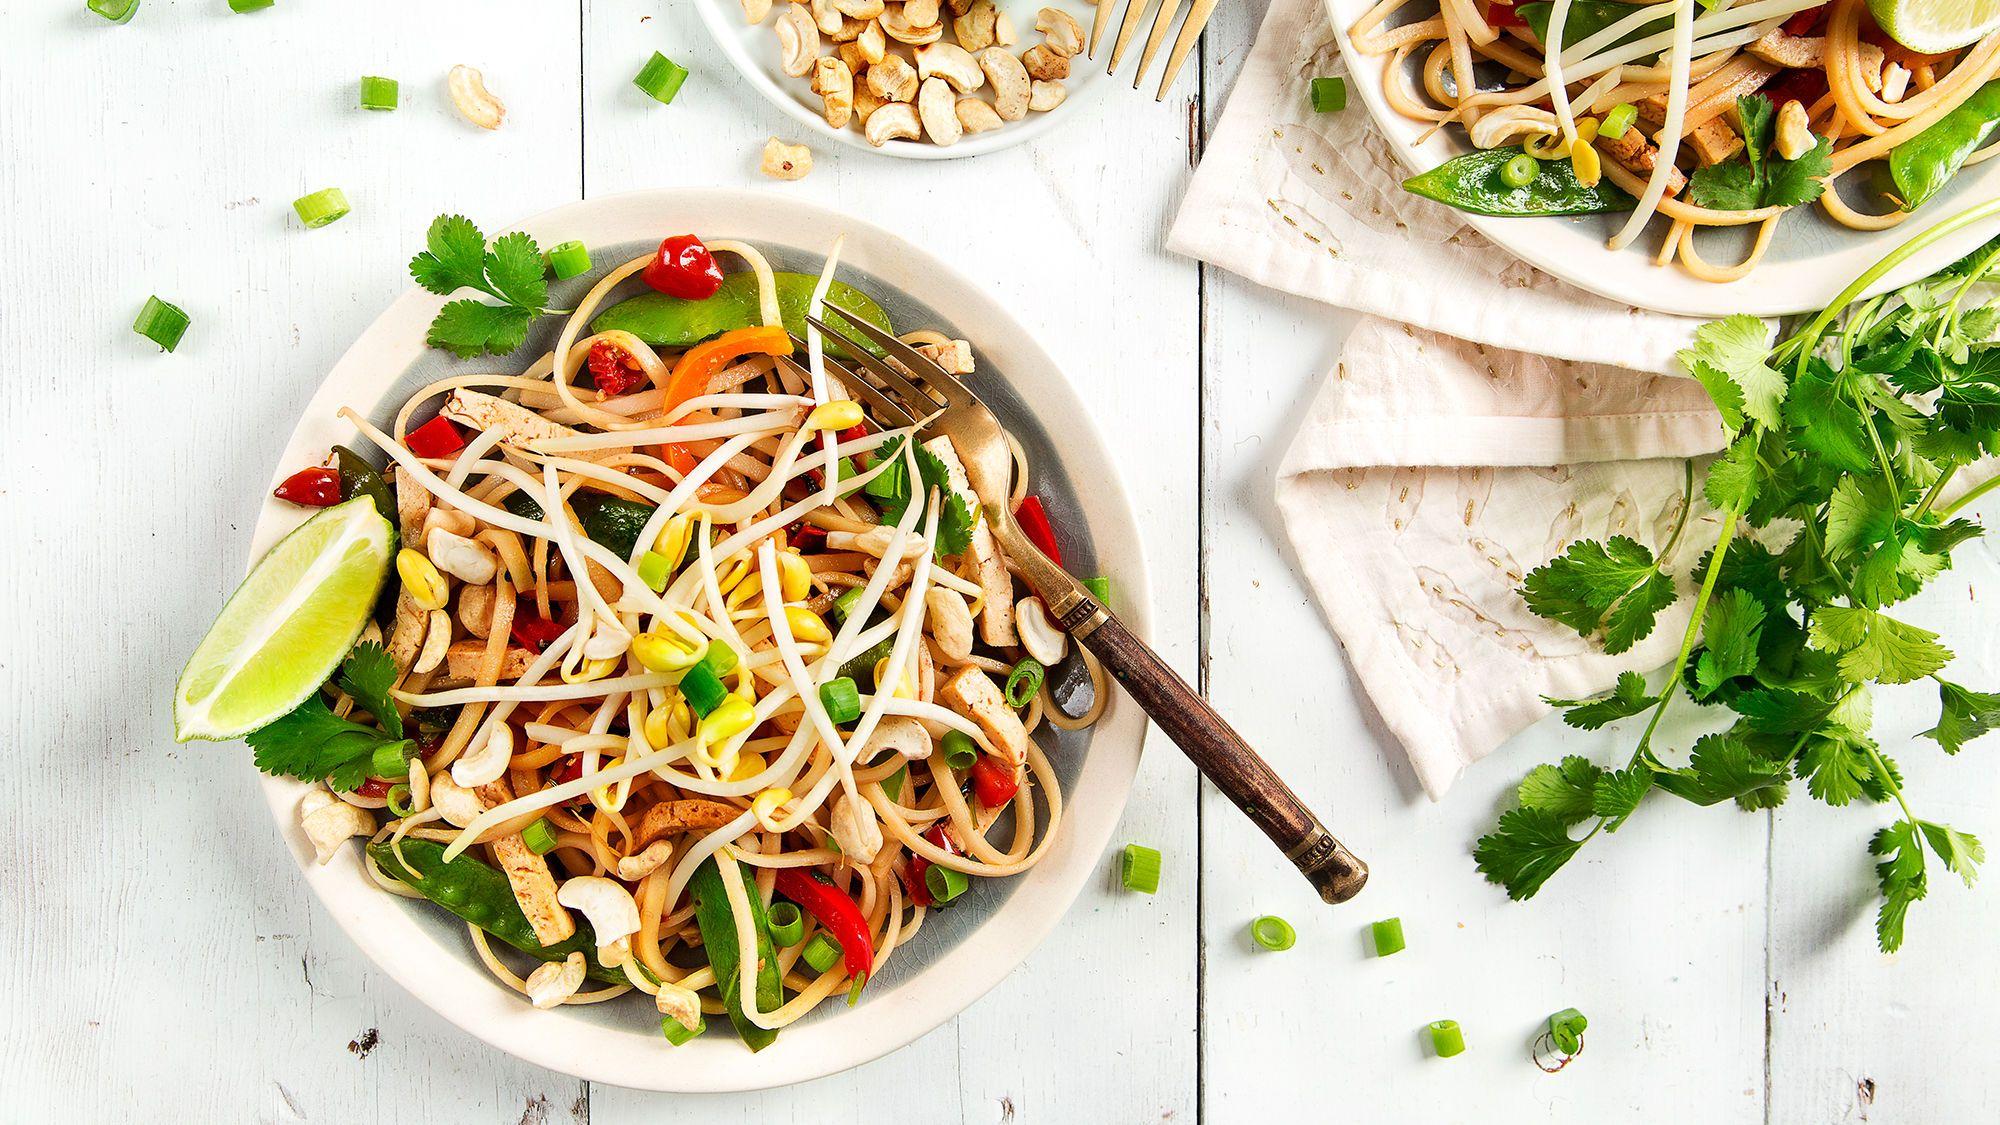 Pad thai recipe food recipes vegetarian recipes